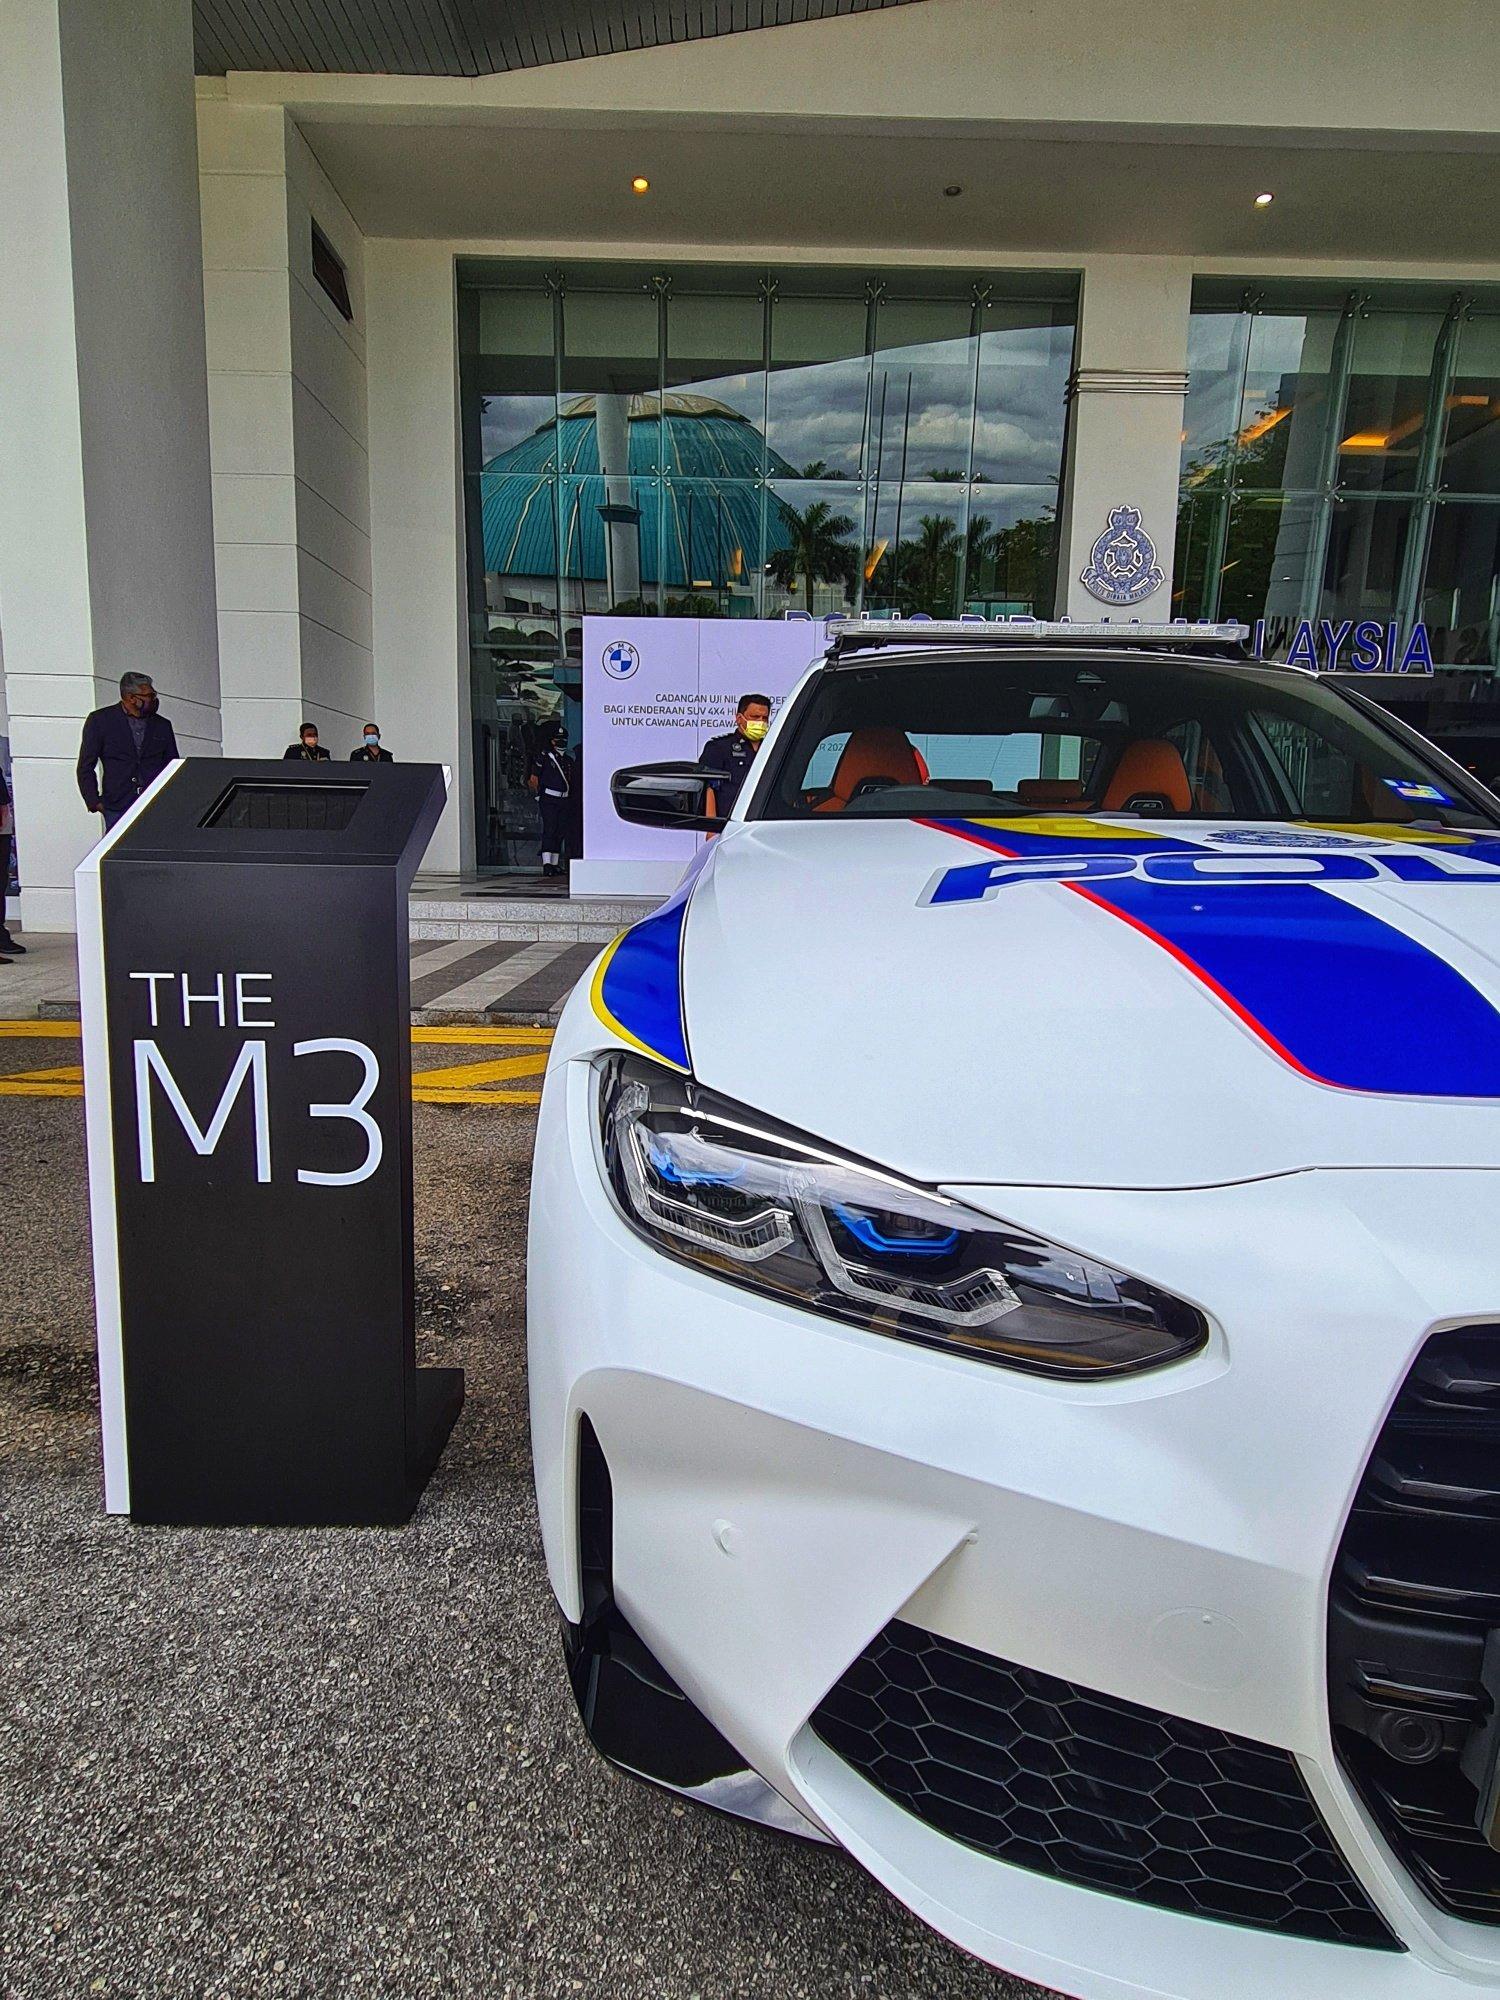 PDRM BMW M3, VW Tiguan_2